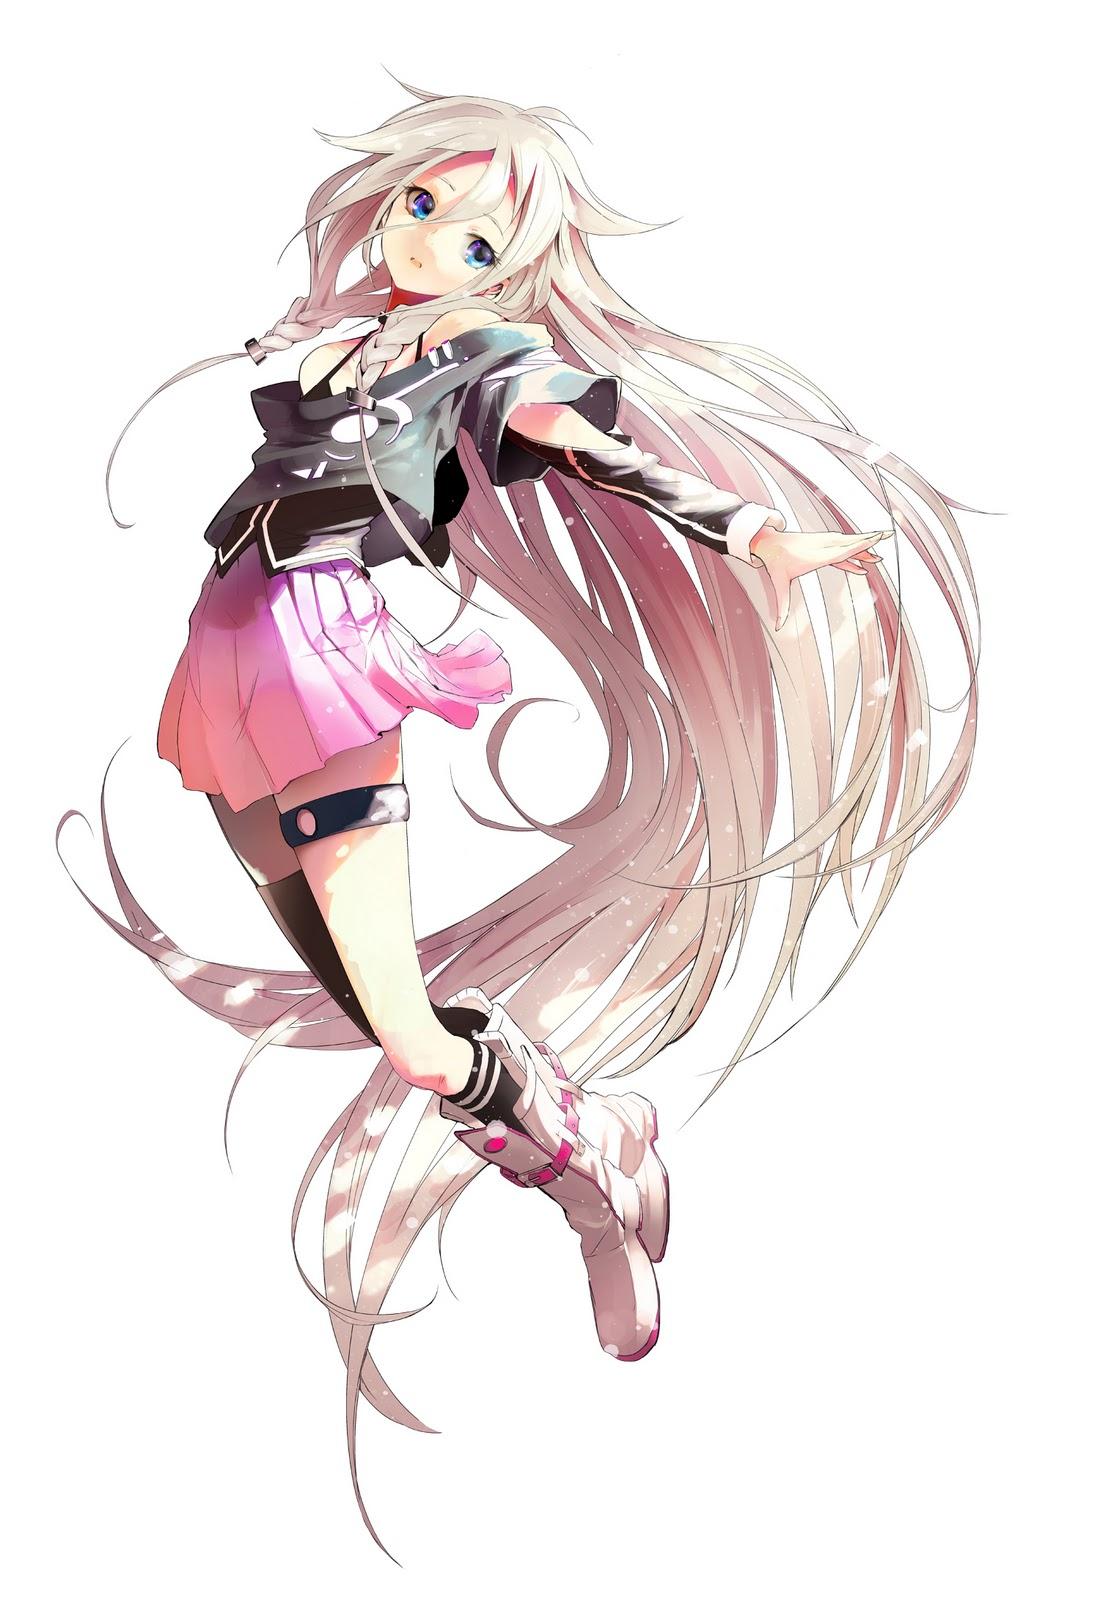 About Vocaloid 3